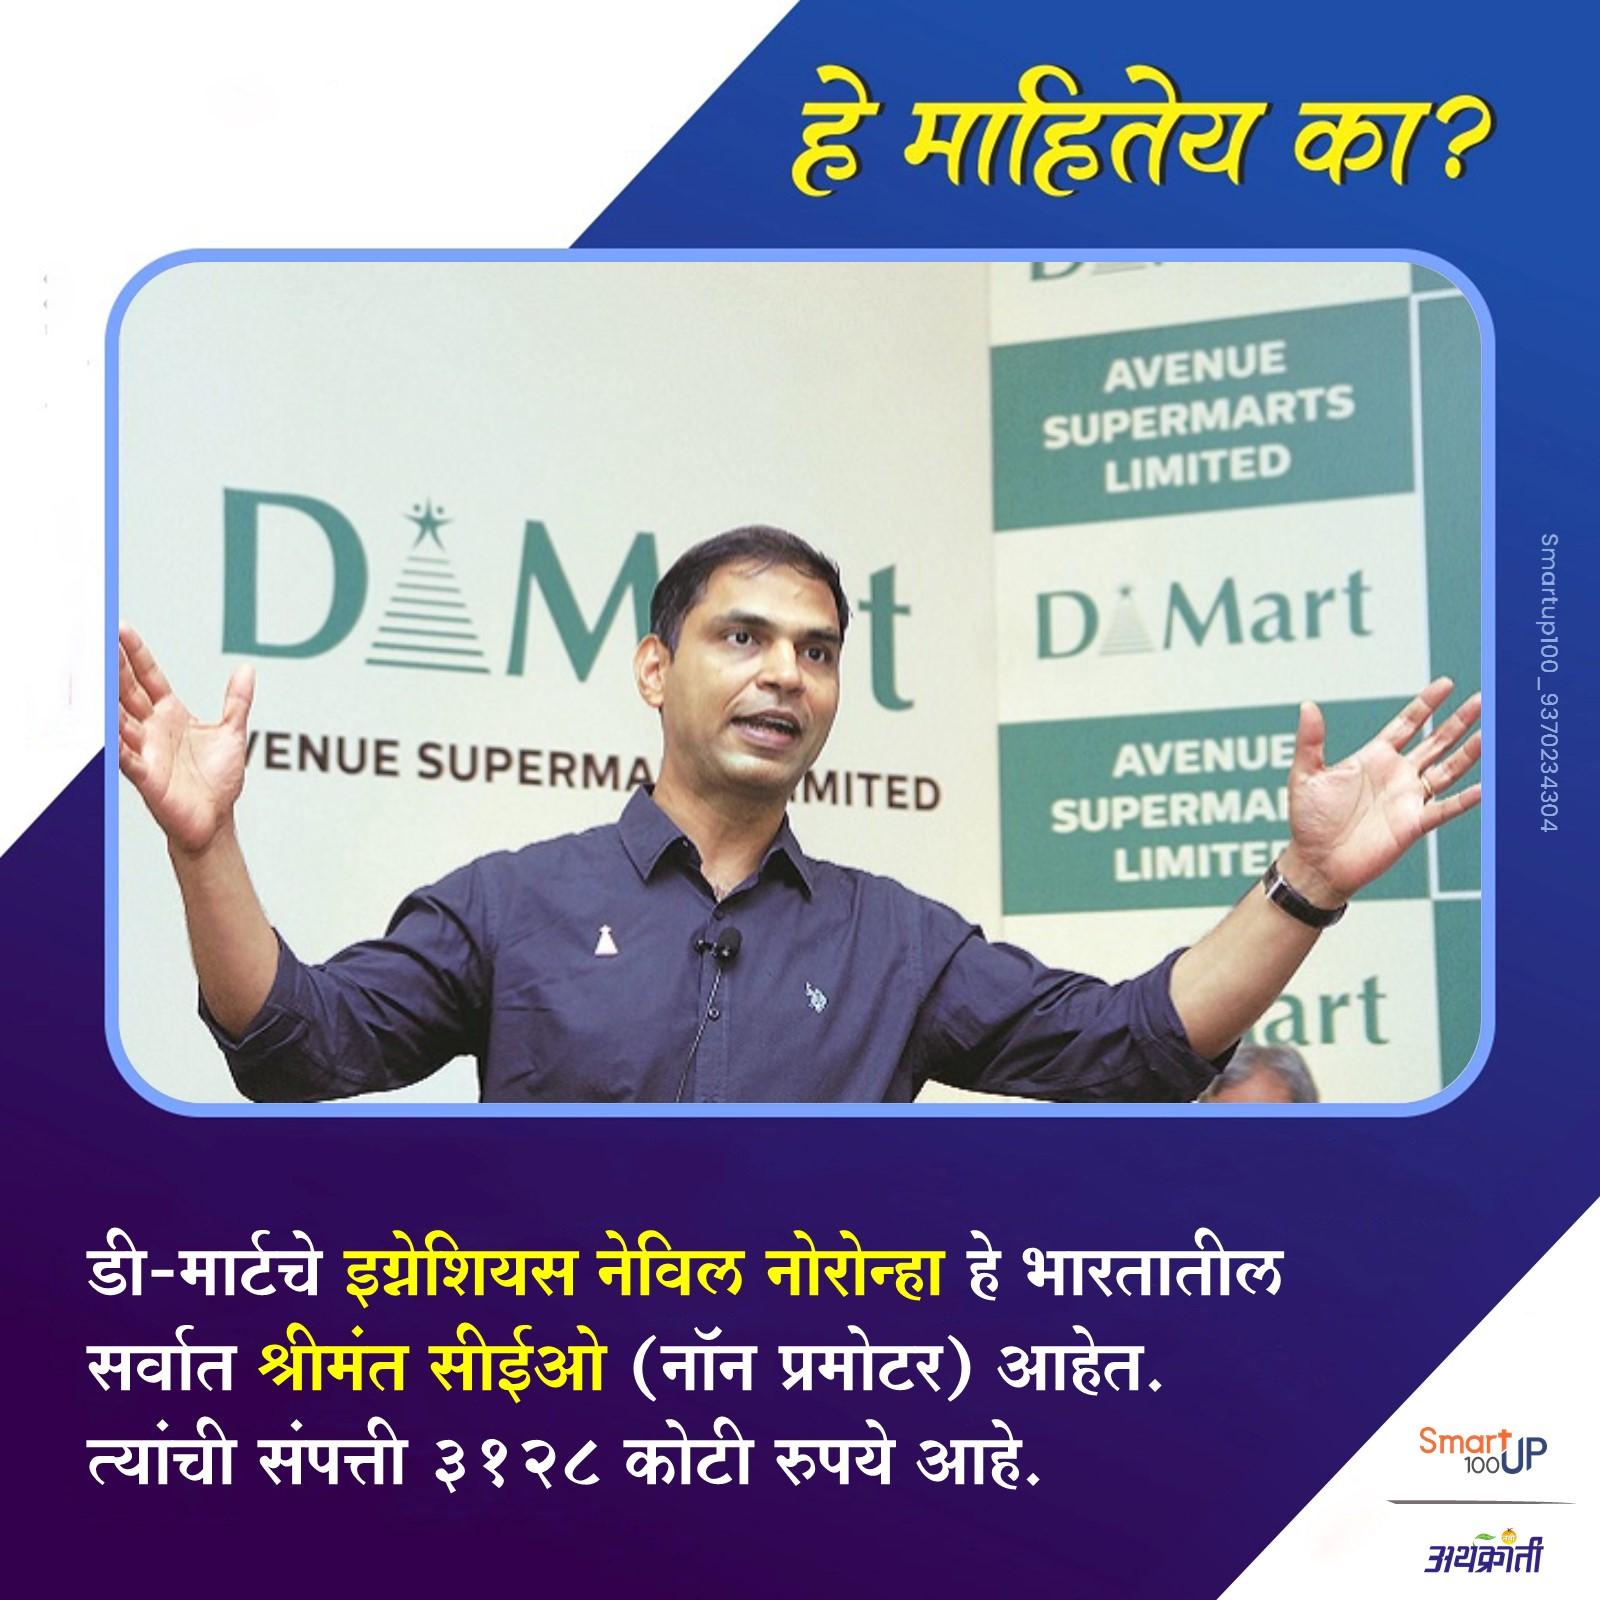 Medical treatment at Mumbai मुंबई येथे वैद्यकीय उपचारा